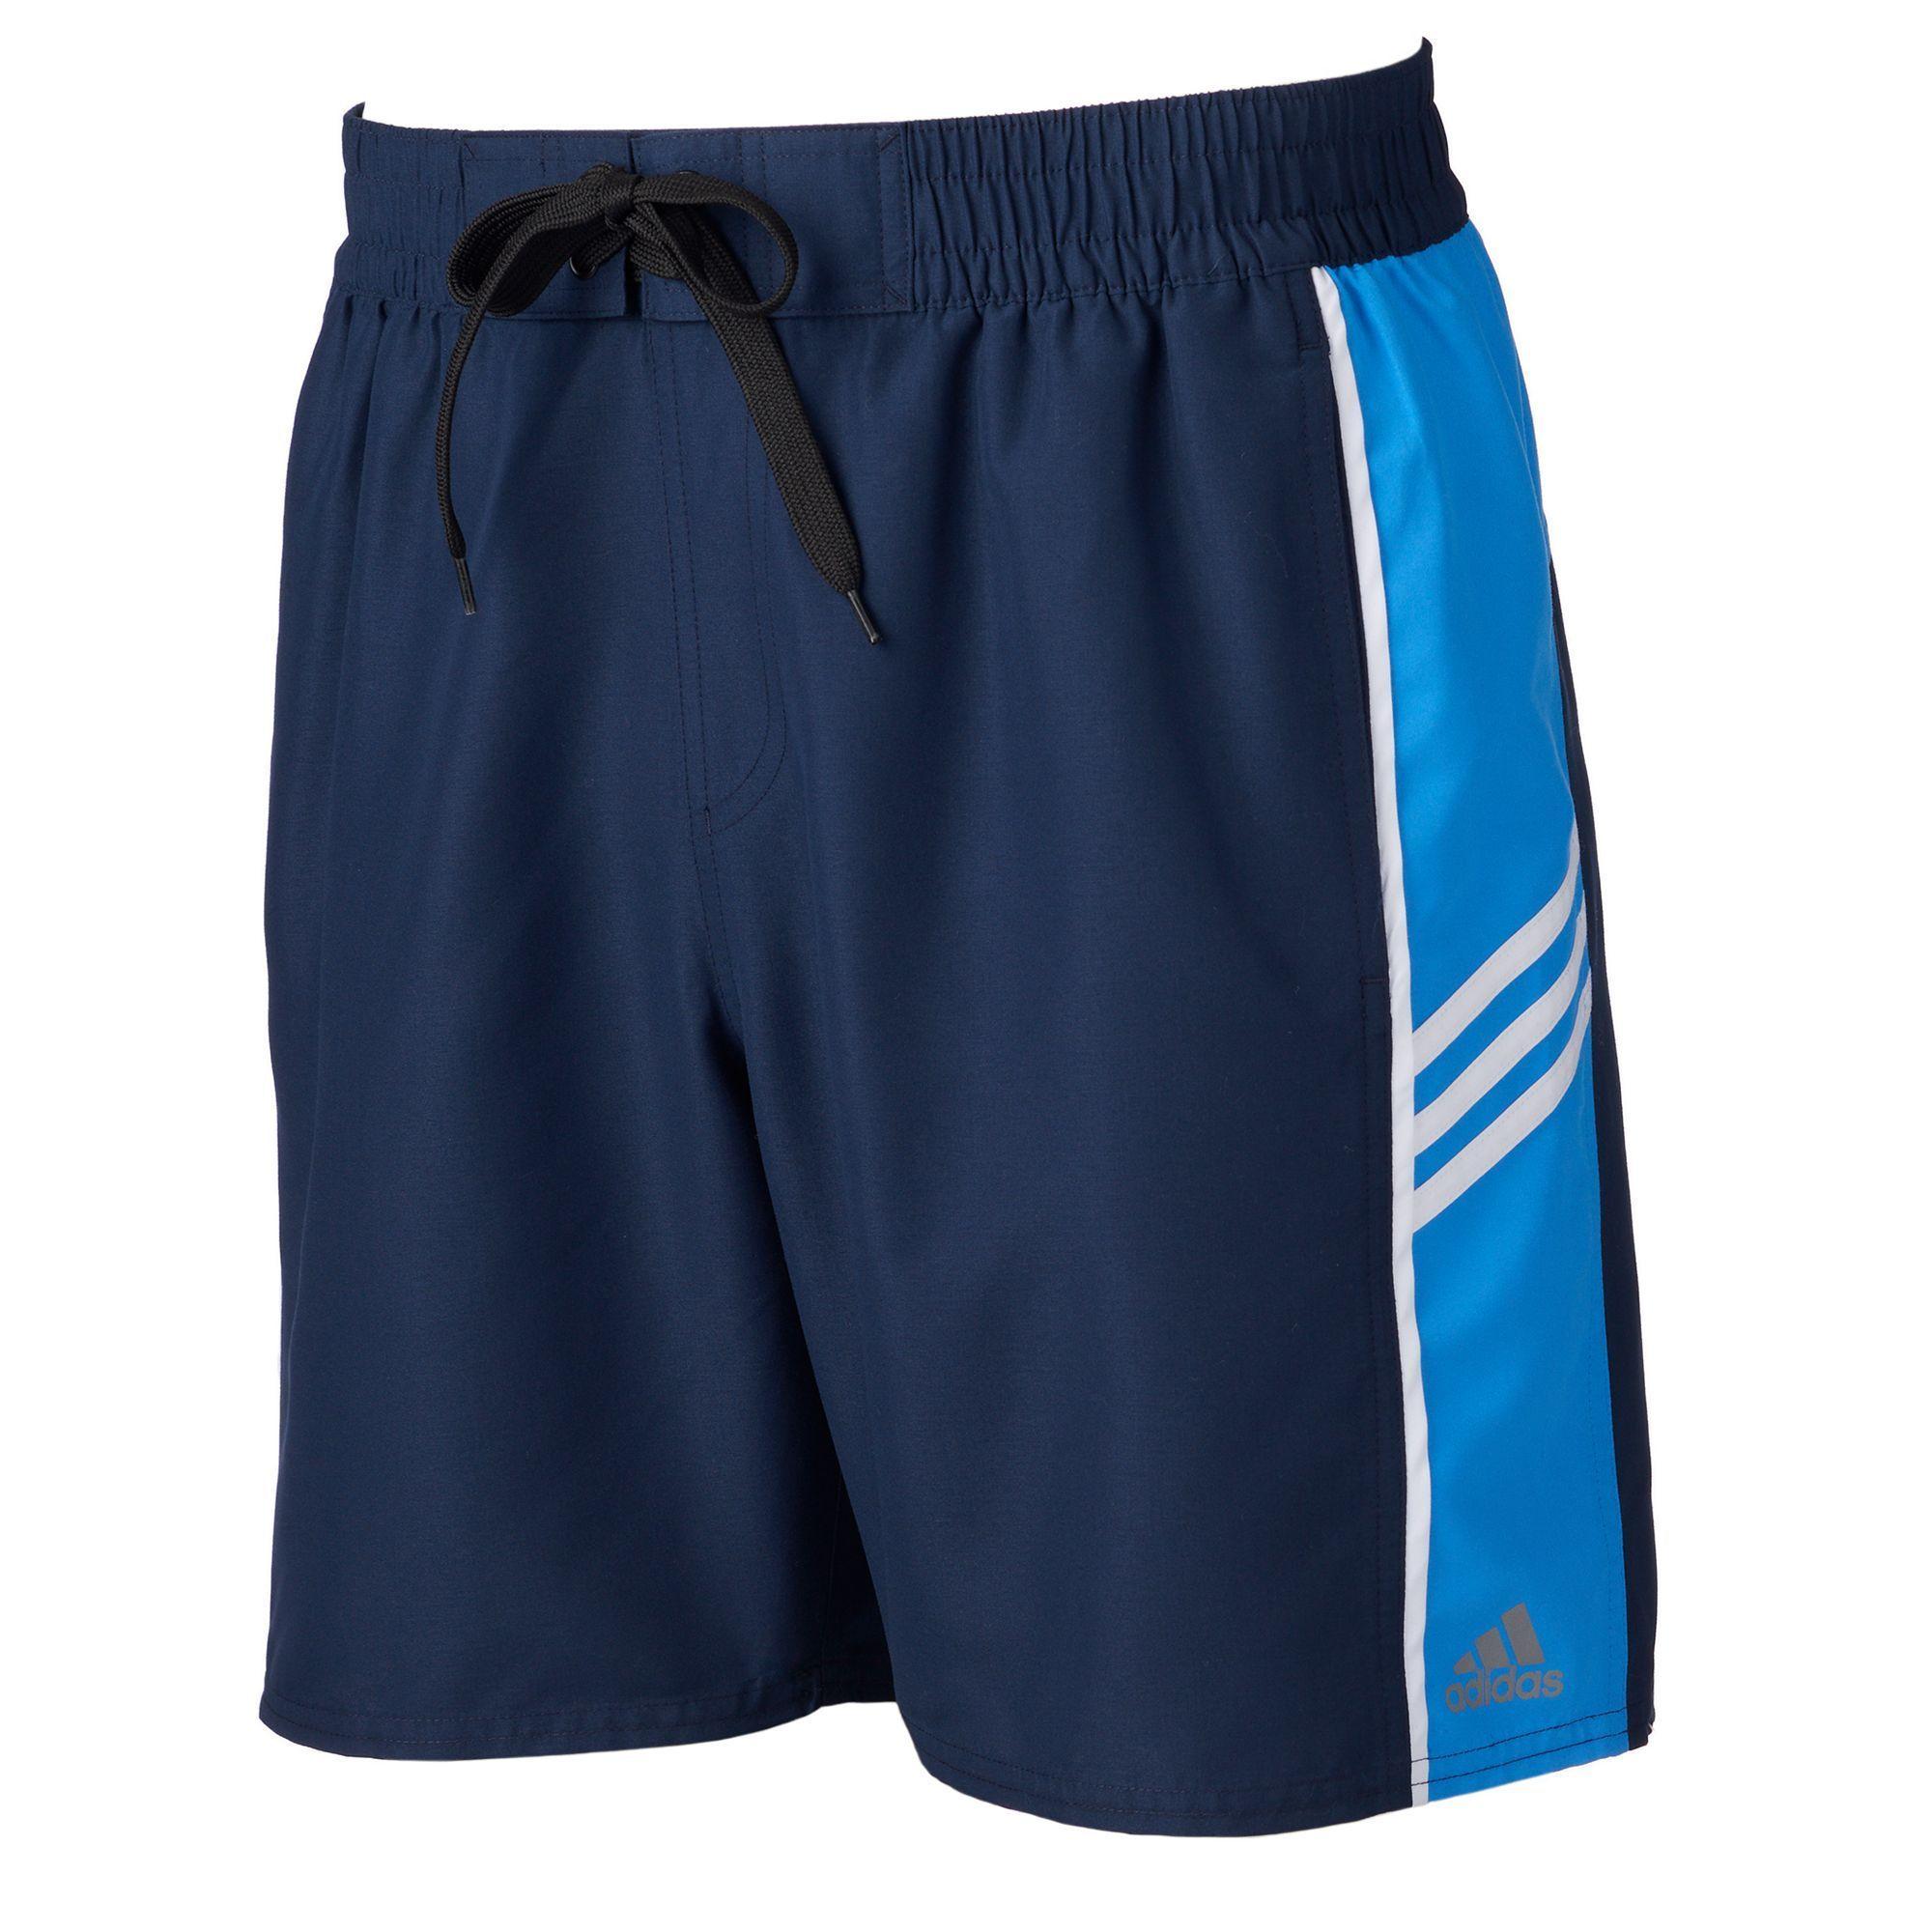 7081853f4f9 Men's Adidas Colorblock Microfiber Volley Swim Trunks, Size: Medium, Blue  (Navy)